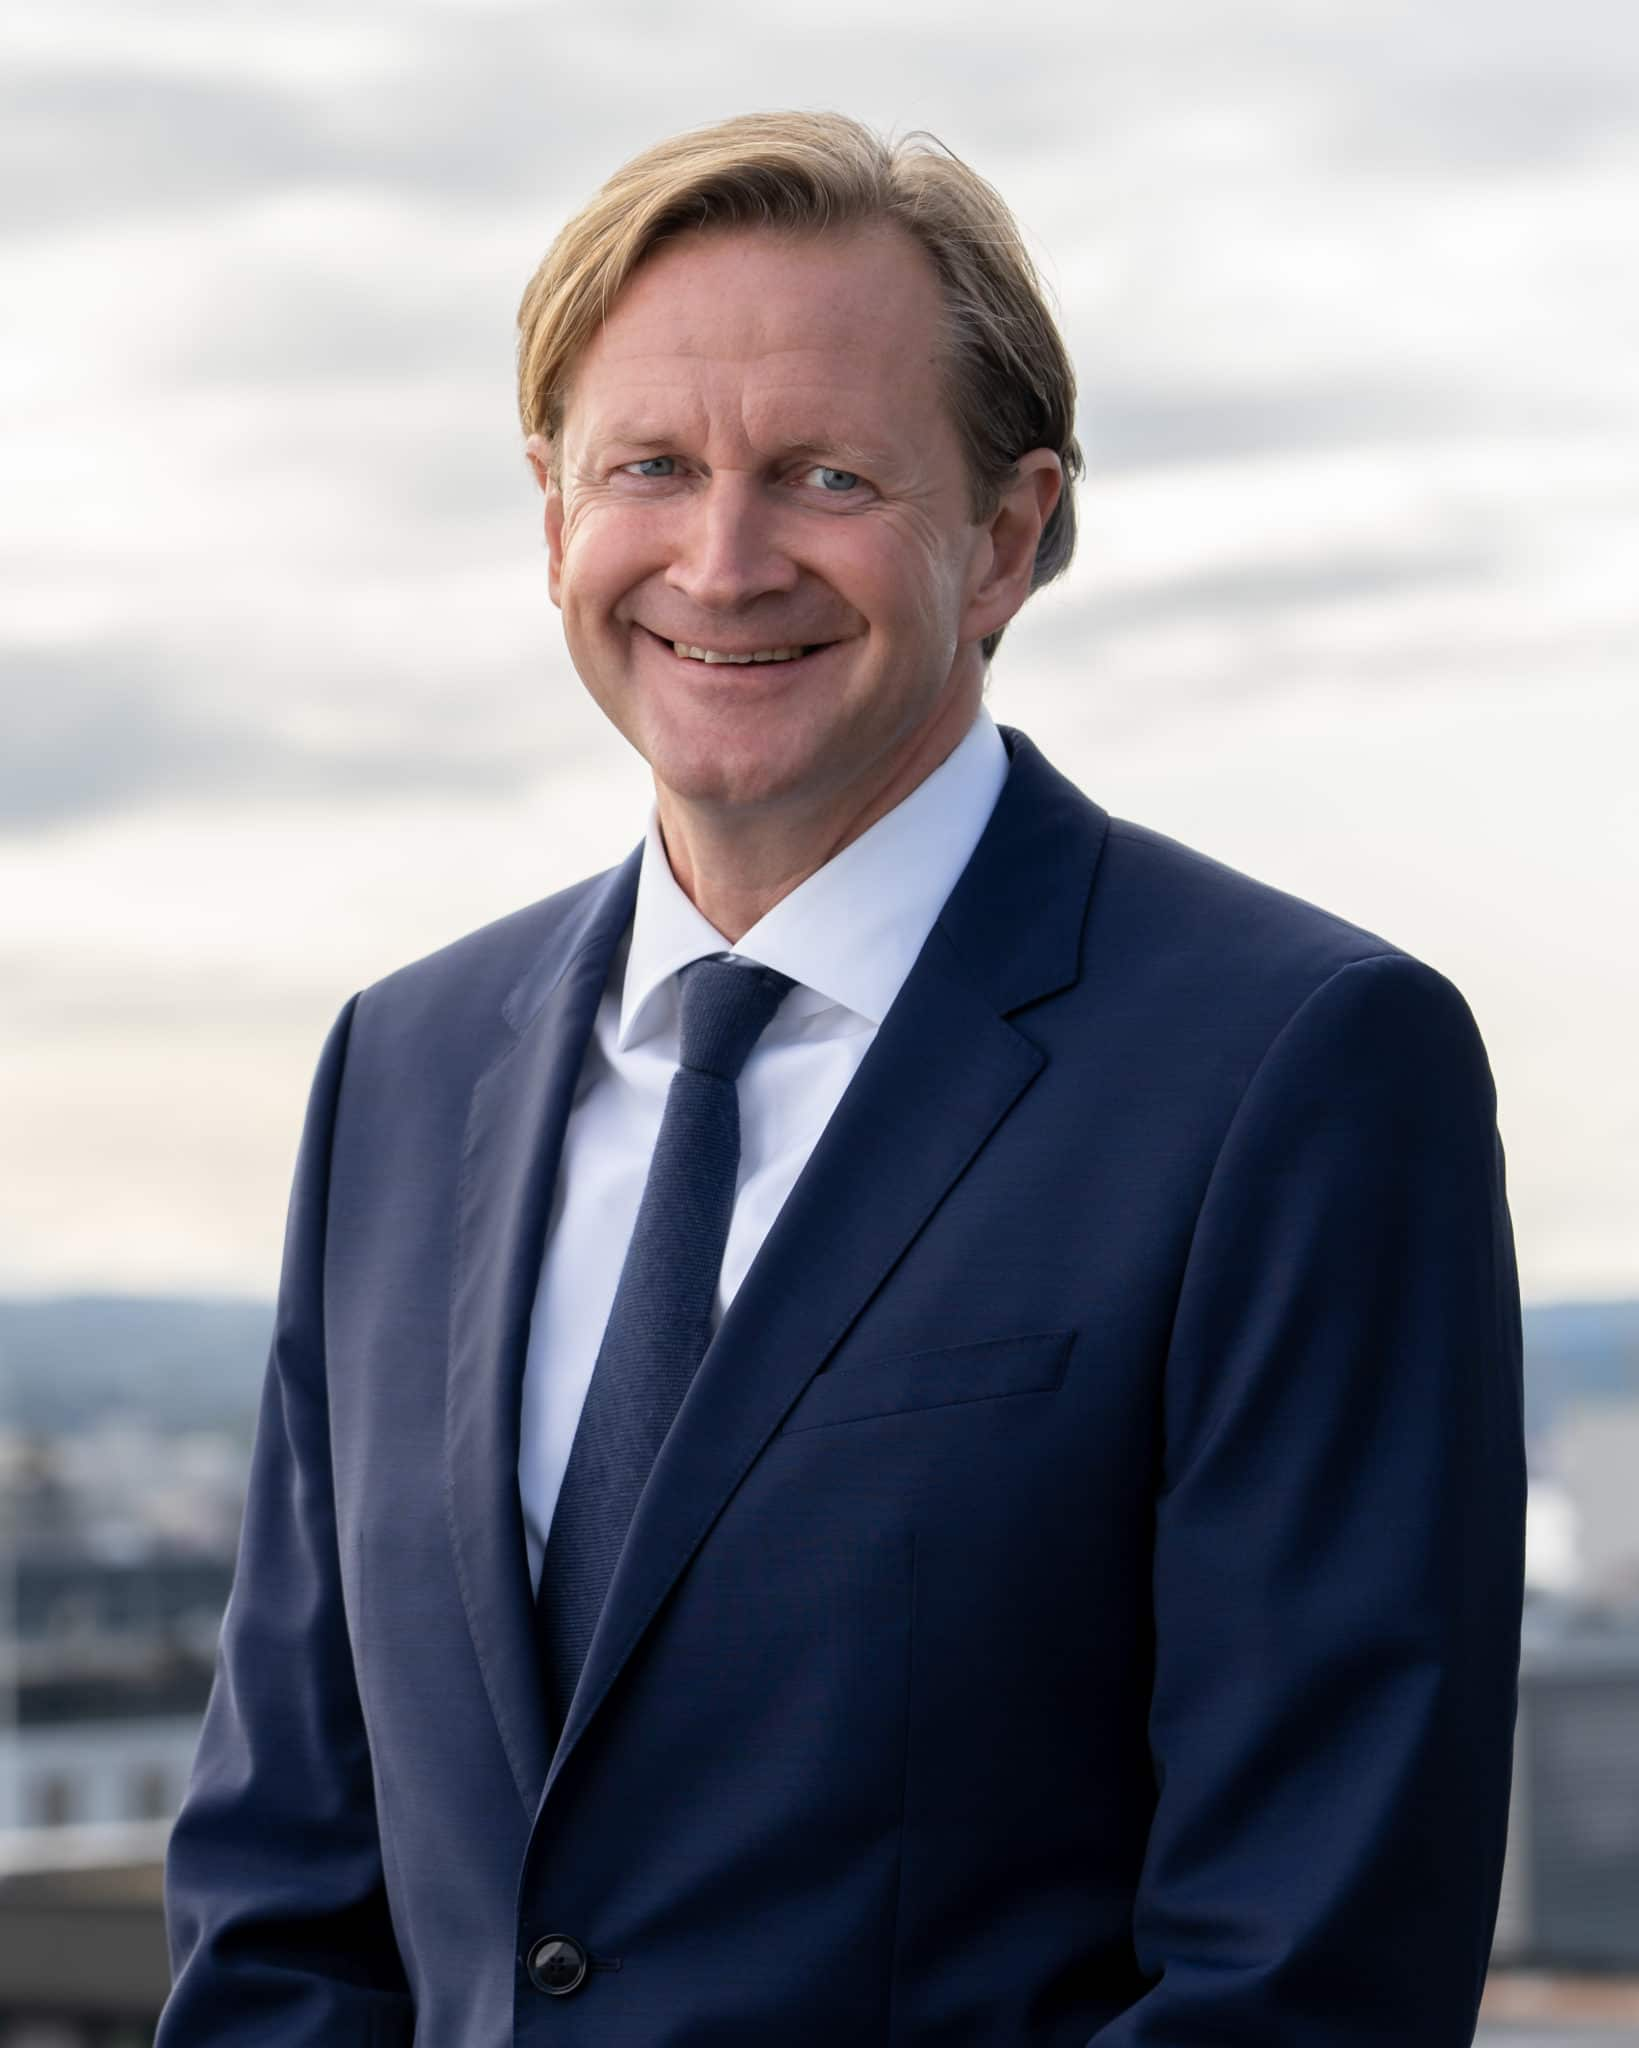 Jens Kristian Johansen